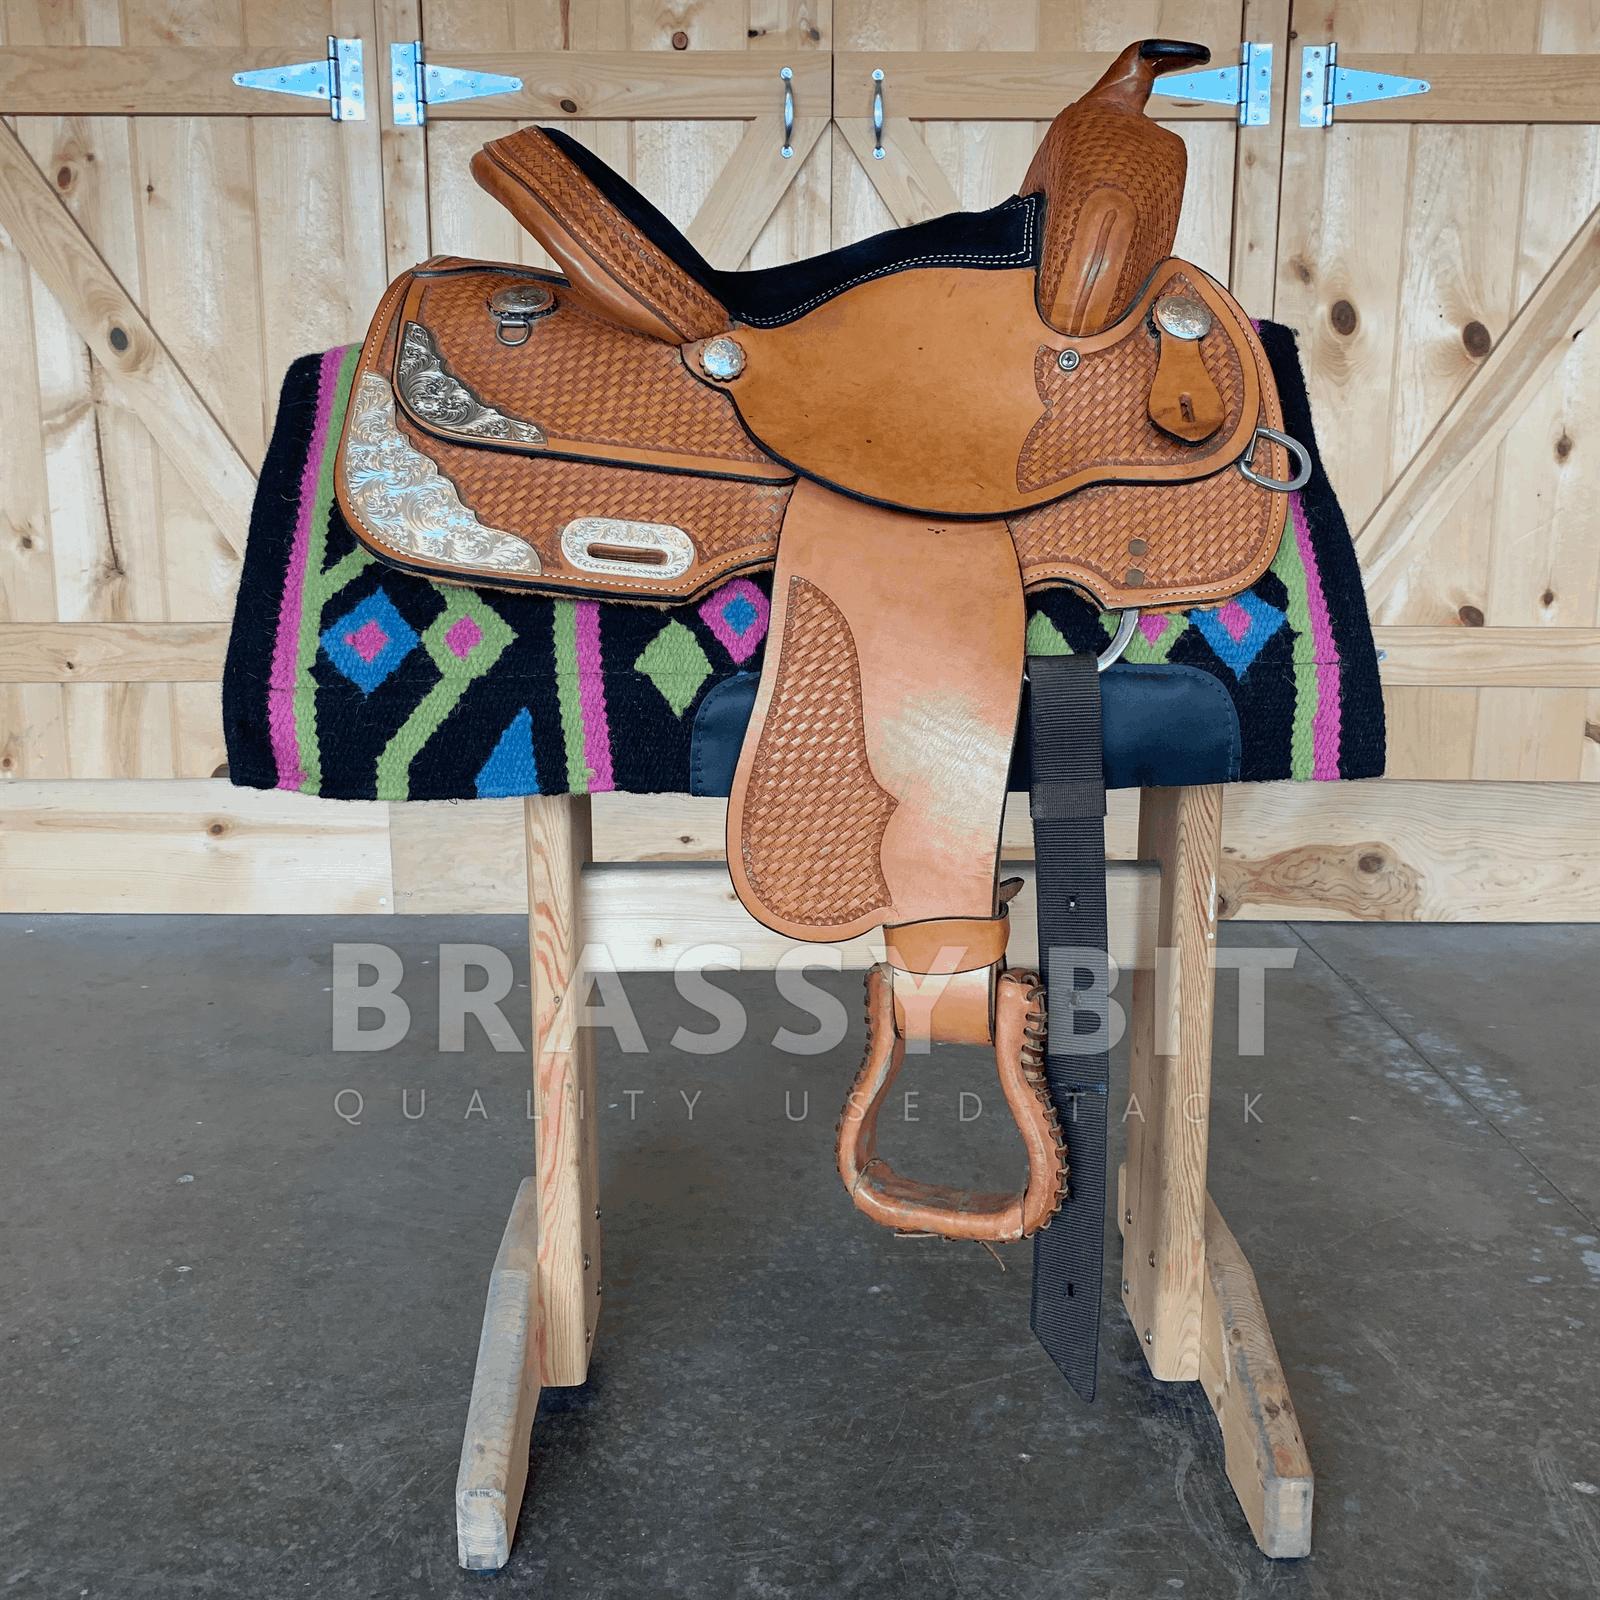 Brassy Bit Tack - Quality Used Tack, Second hand saddles